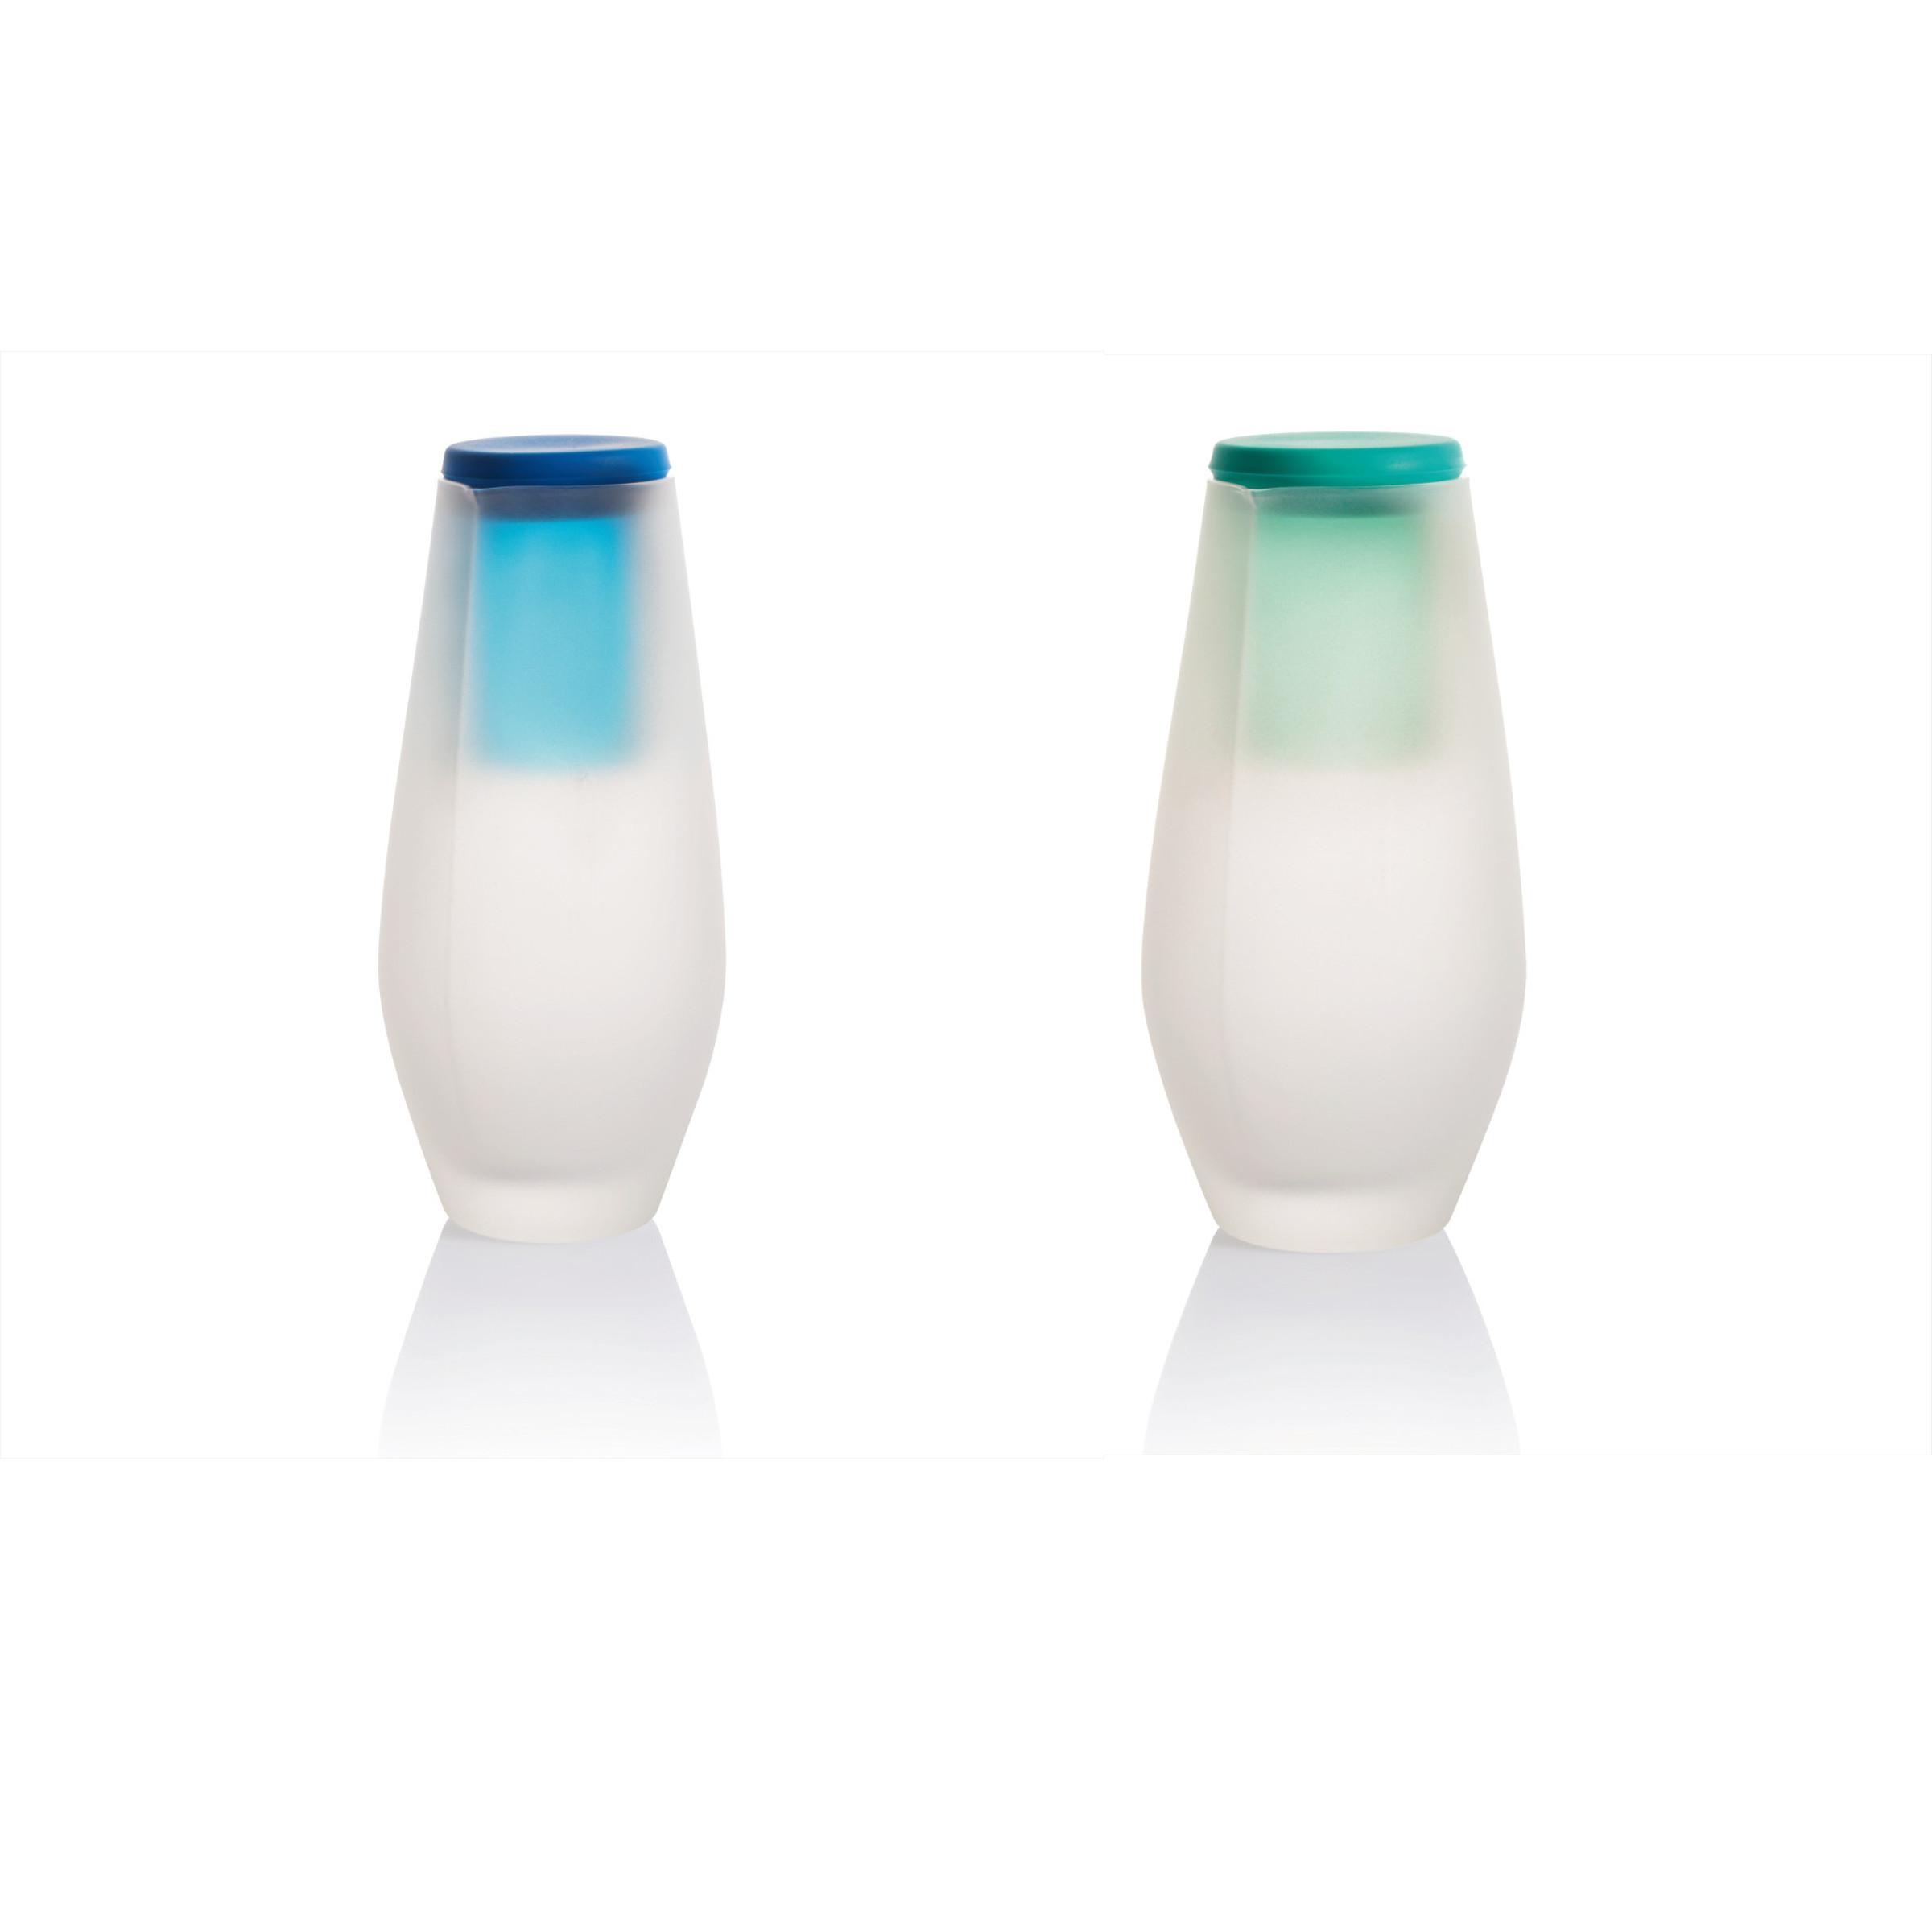 Design-Karaffe mit Trinkglas